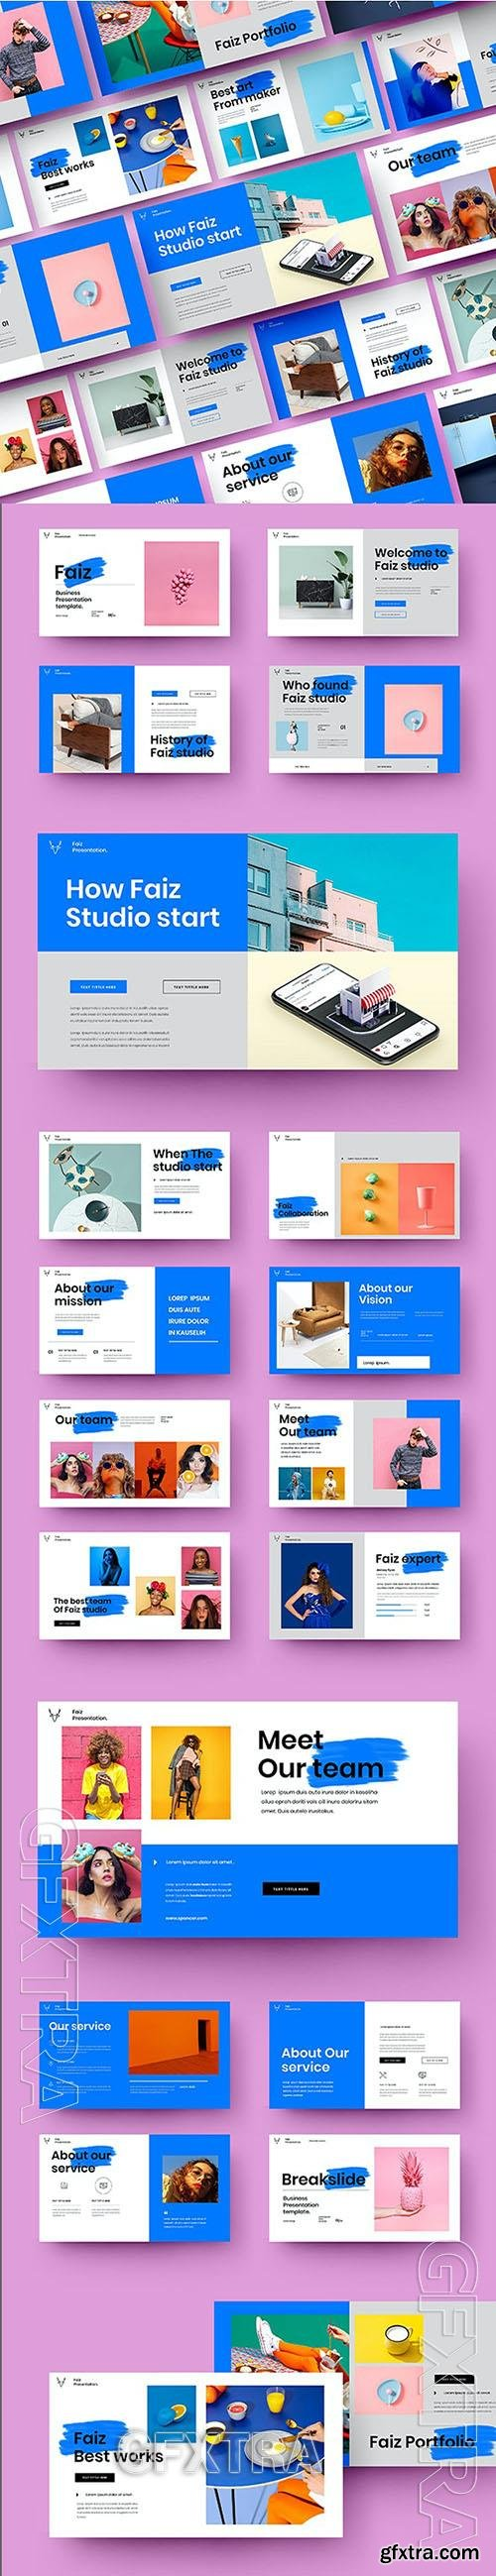 Faiz - Business Powerpoint, Keynote and Google Slides Template